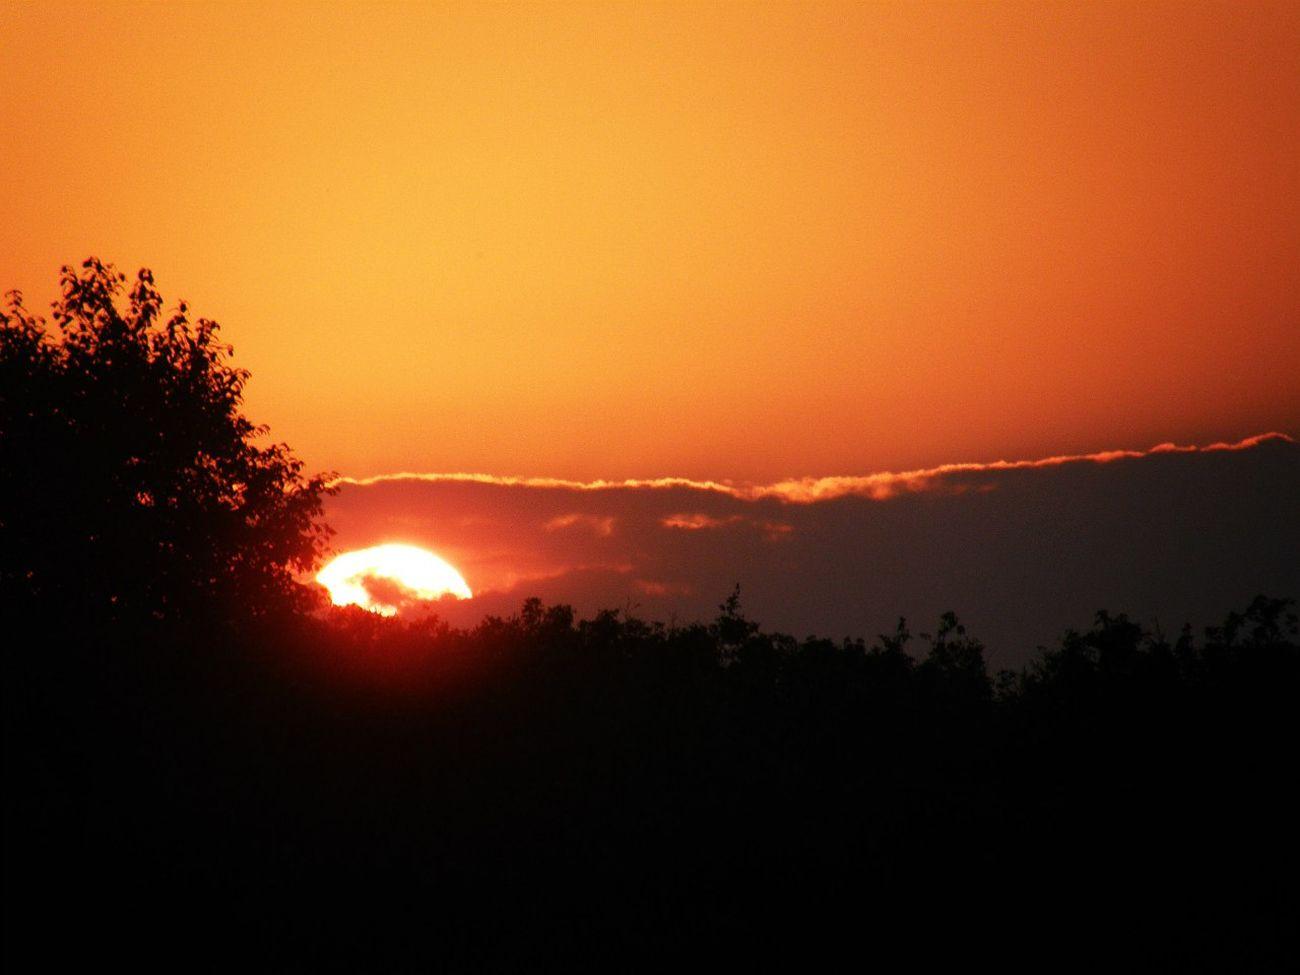 Sunset Sun Beautiful Sunset Nature Perfect Sky